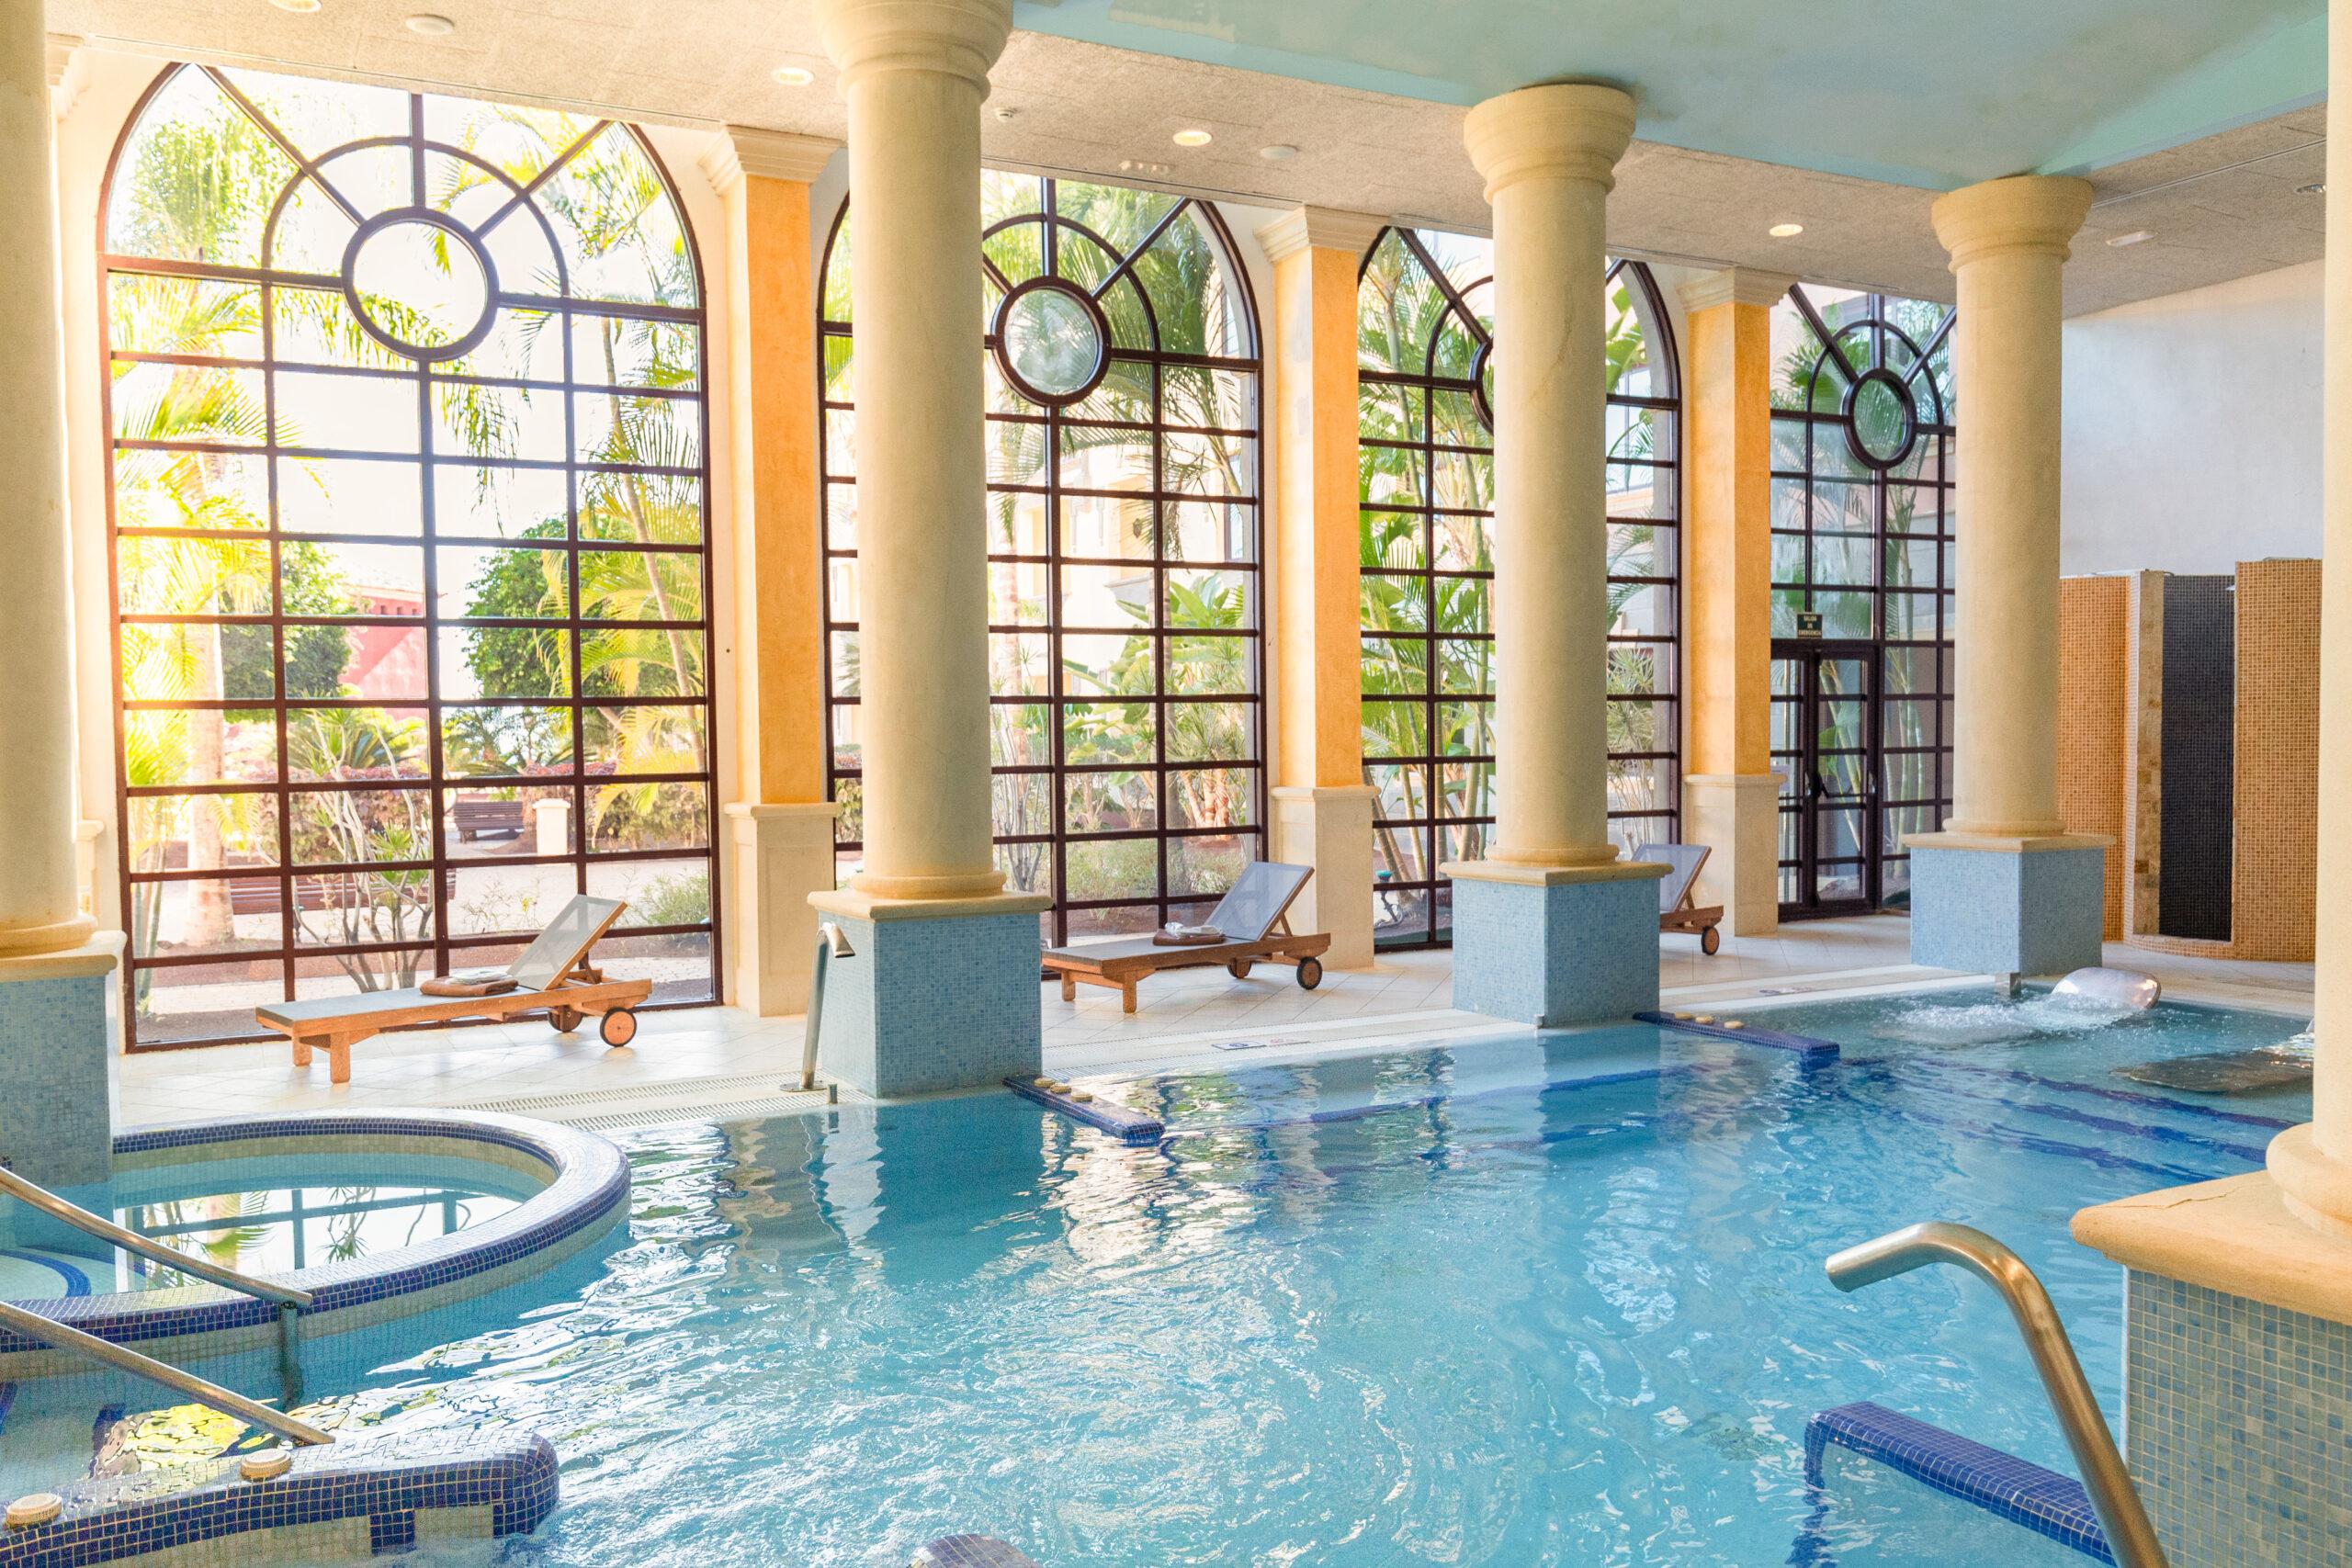 R2 RIO CALMA HOTEL COSTA CALMA FUERTEVENTURA wellness and spa